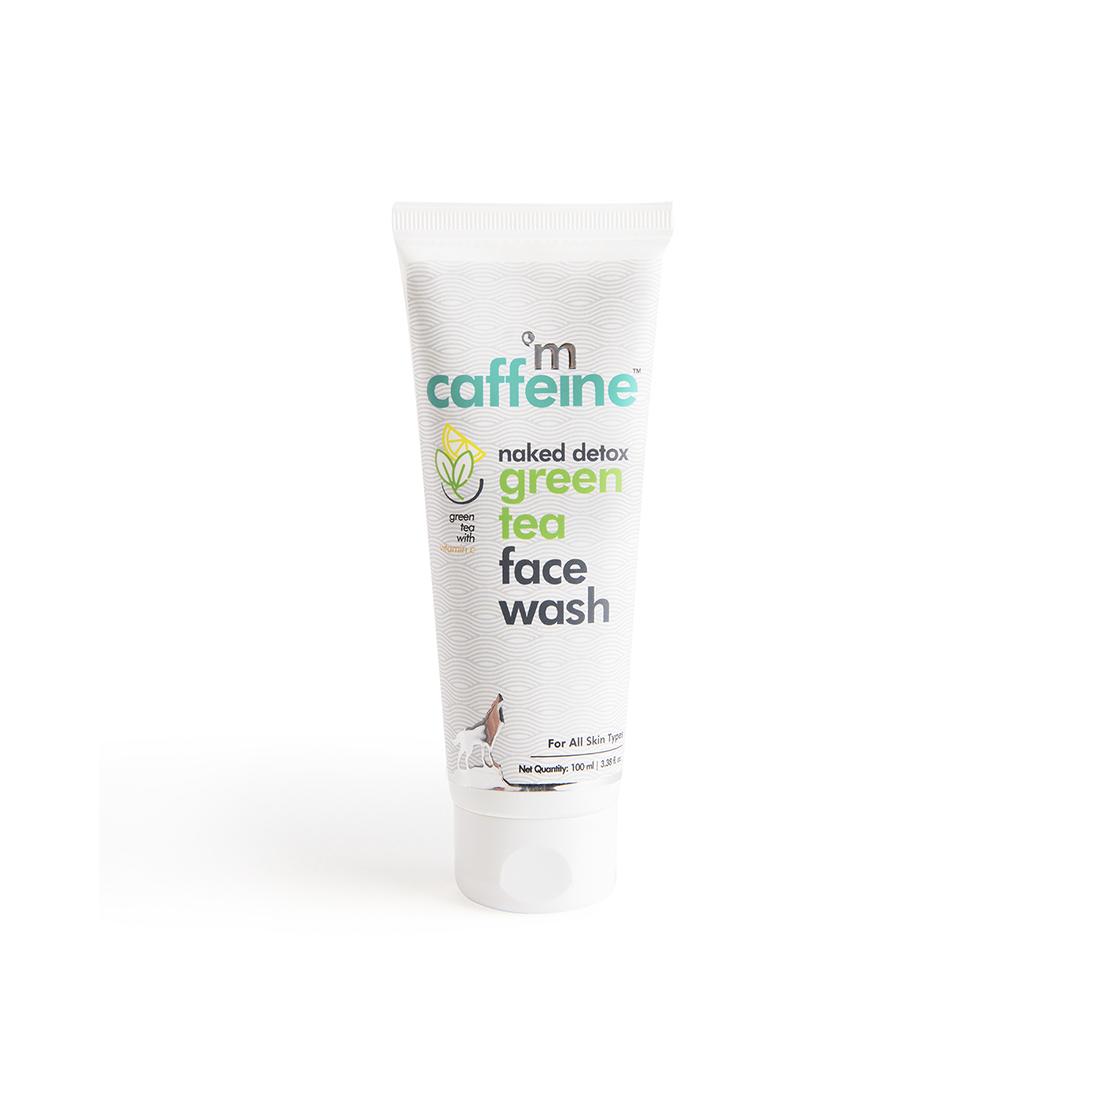 MCaffeine | mCaffeine Naked Detox Dirt Removal Green Tea Face Wash (100 ml)